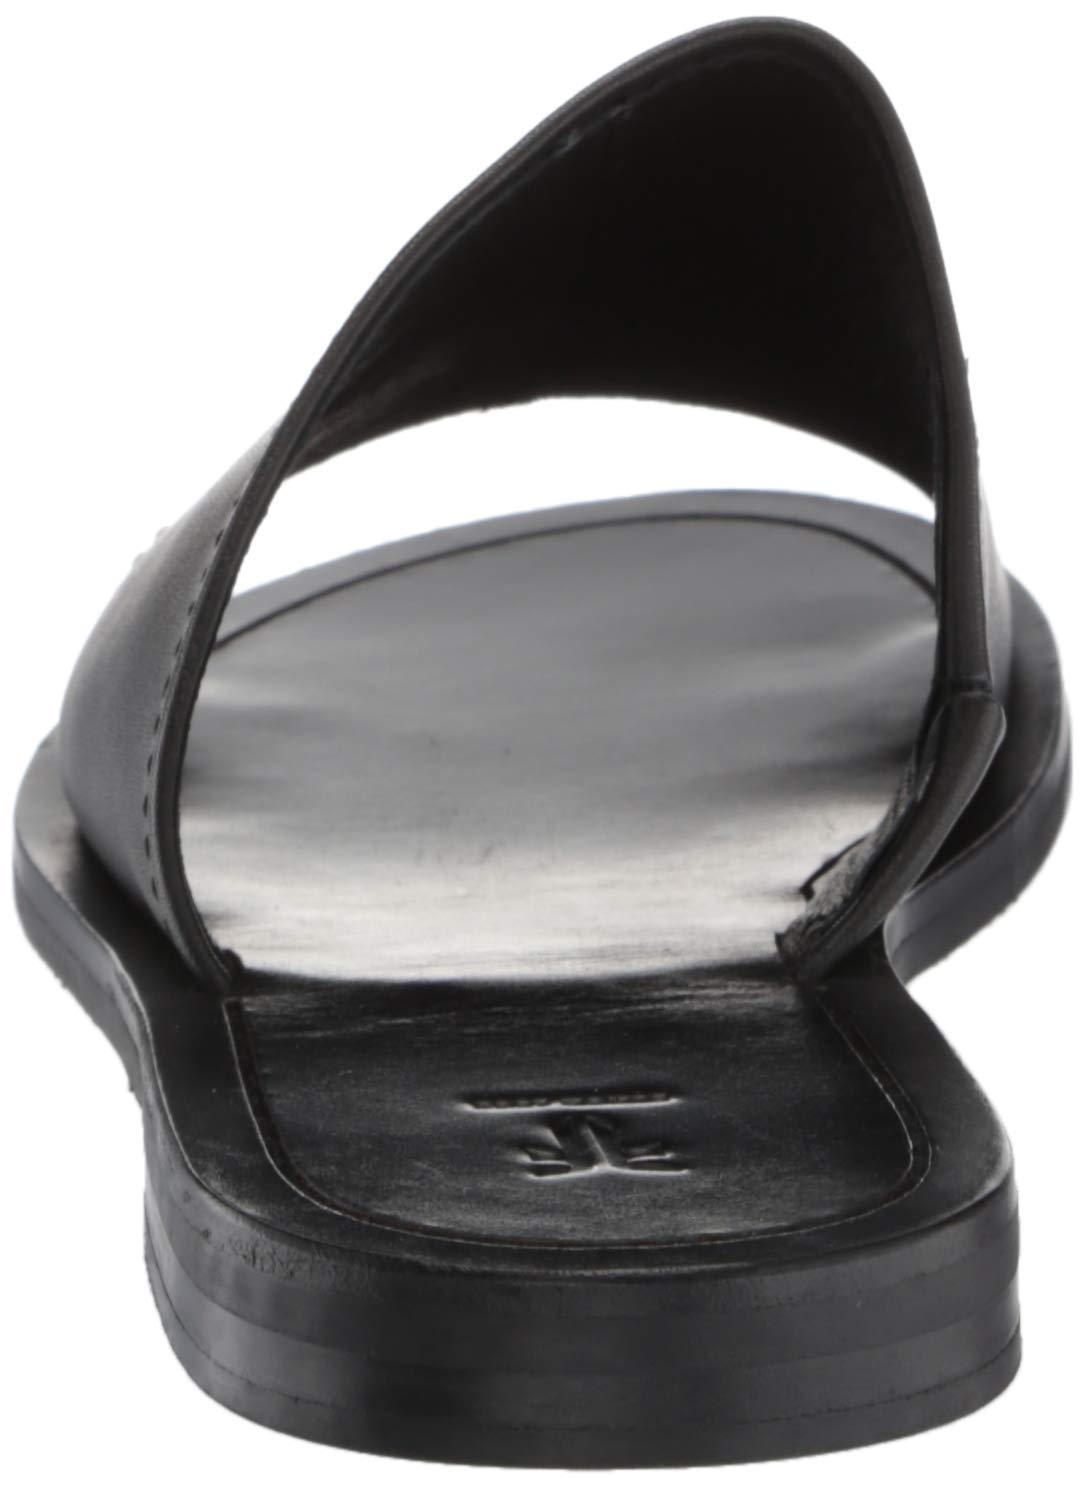 Frye Women S Robin Slide Flat Sandal Black 5 5 M